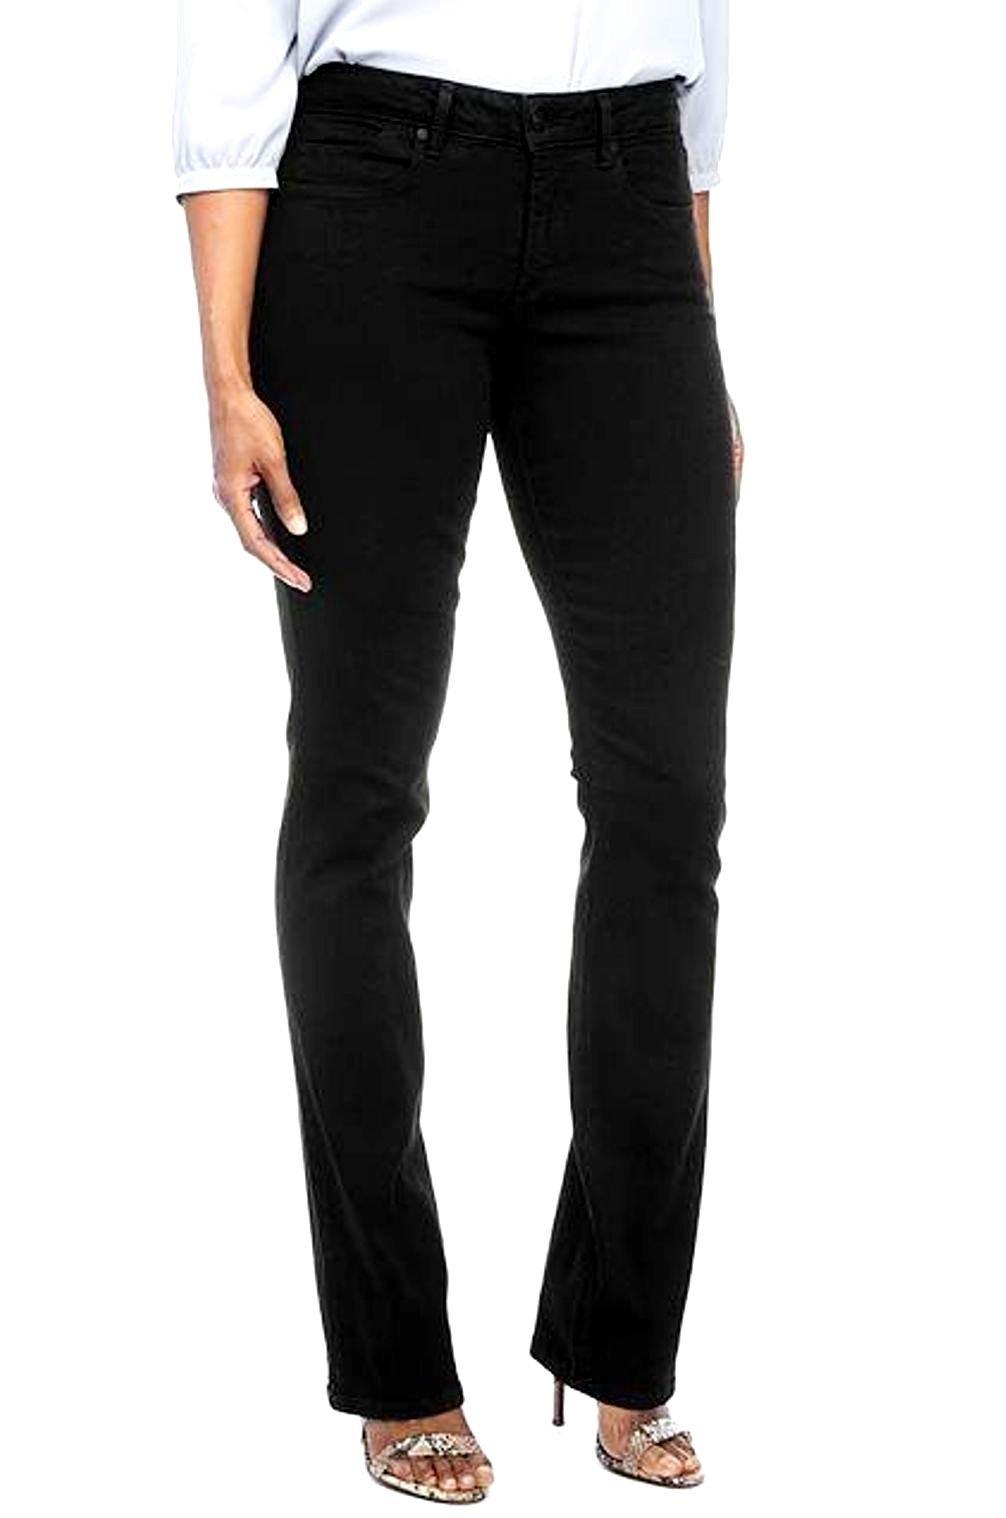 J&C Extended Womens Plus Size Blue/Black Denim Jean Tall Long Tummy Technology (20 Plus, Black)